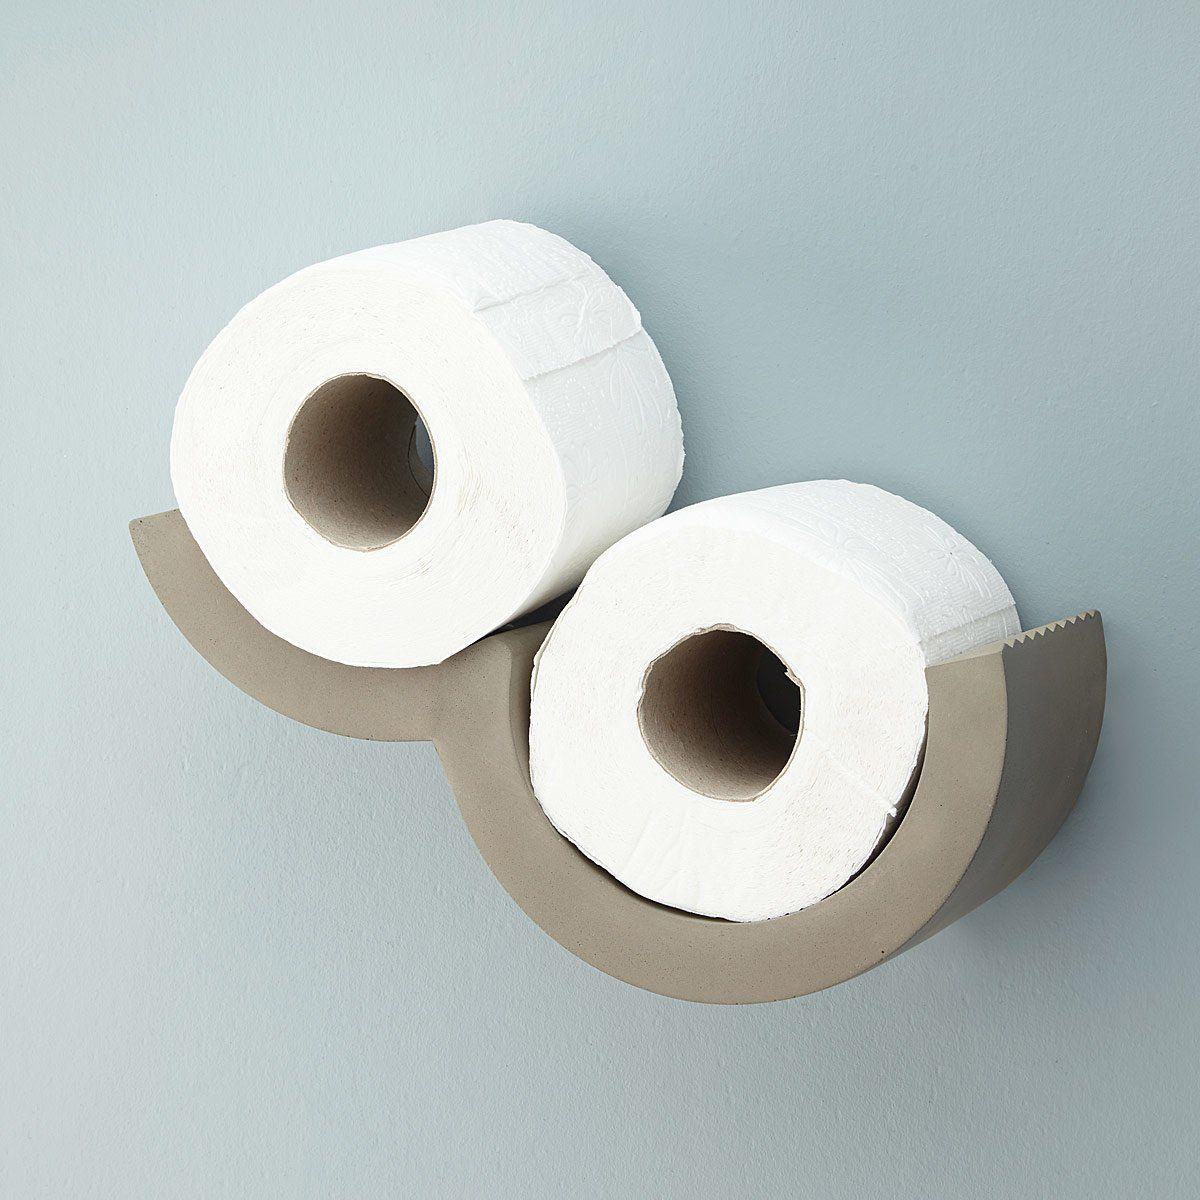 Mini Cloud Toilet Paper Dispenser Toilet Paper Toilet Paper Dispenser Cloud Toilet Paper Holder